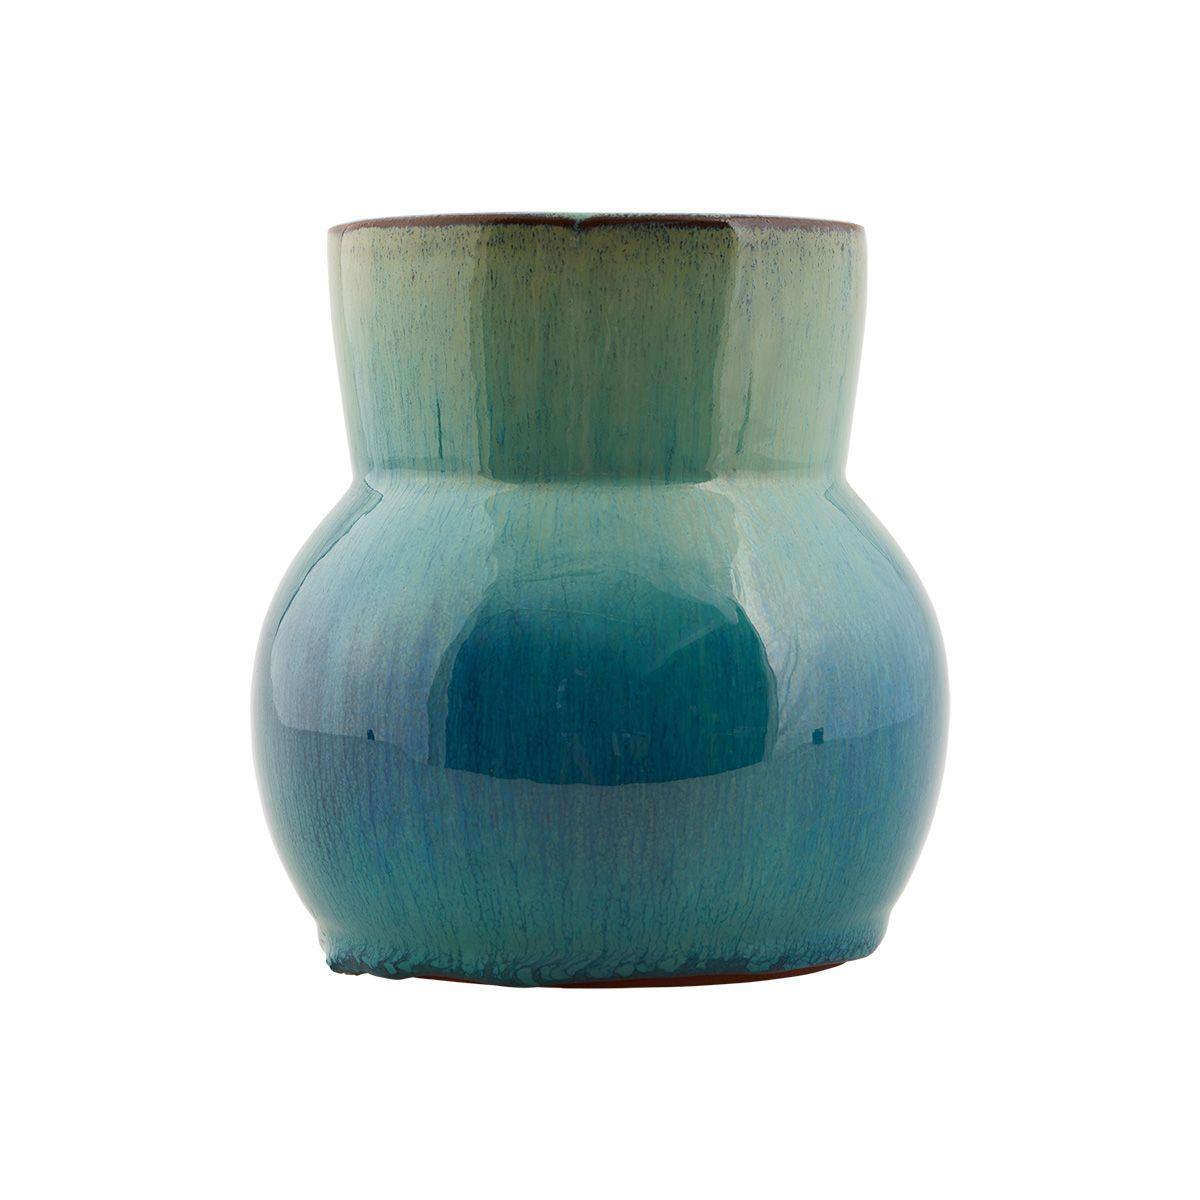 Ceramic vase by House Doctor Skandinavisk design